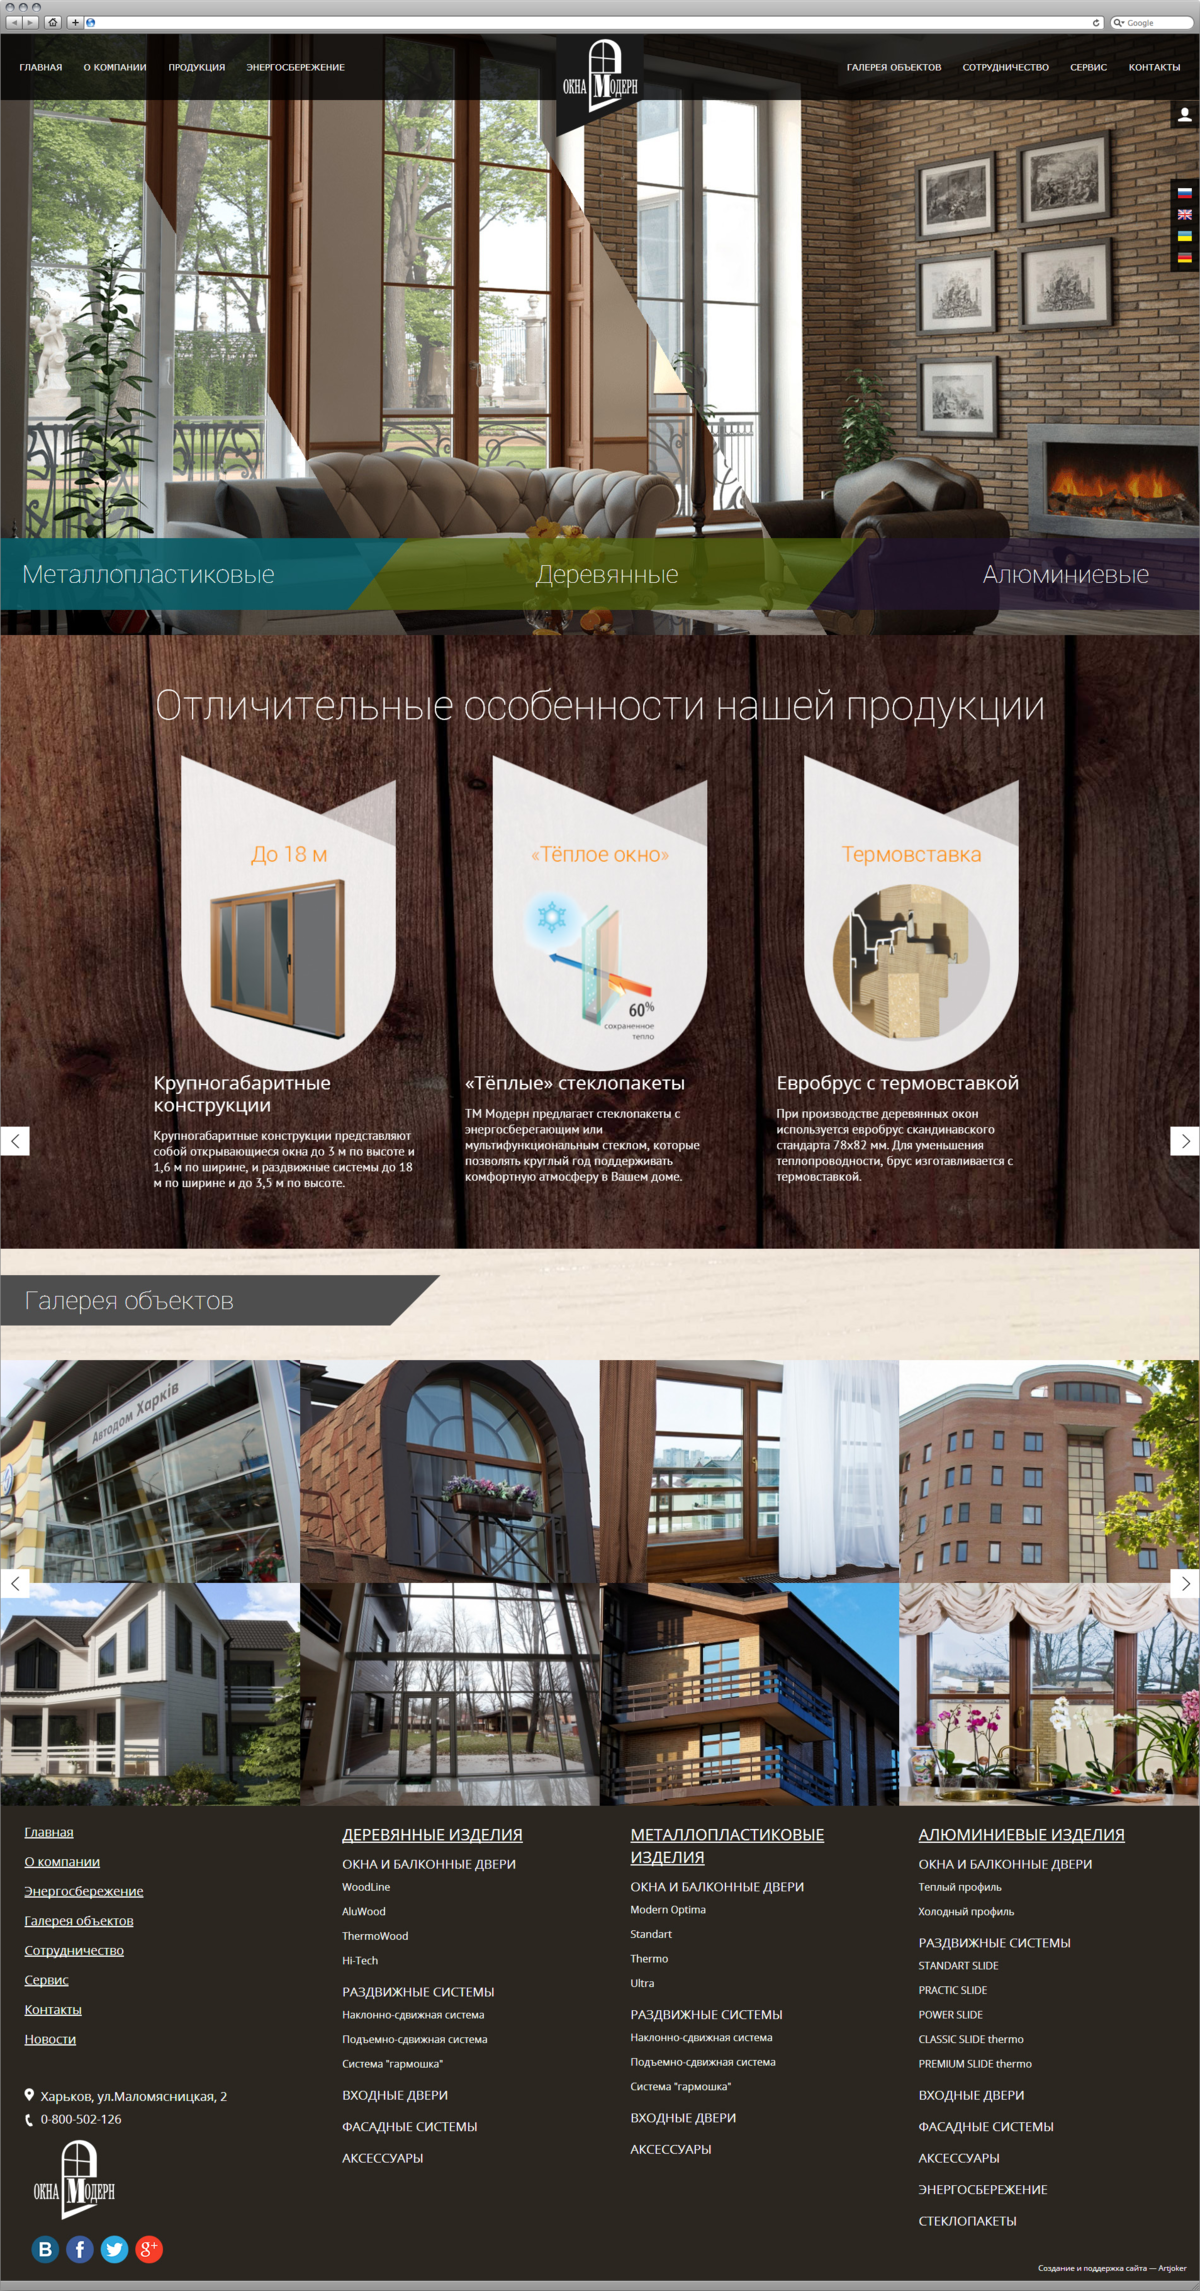 Сайт Модерн-ХХI / Проект компании Web-студия Artjoker